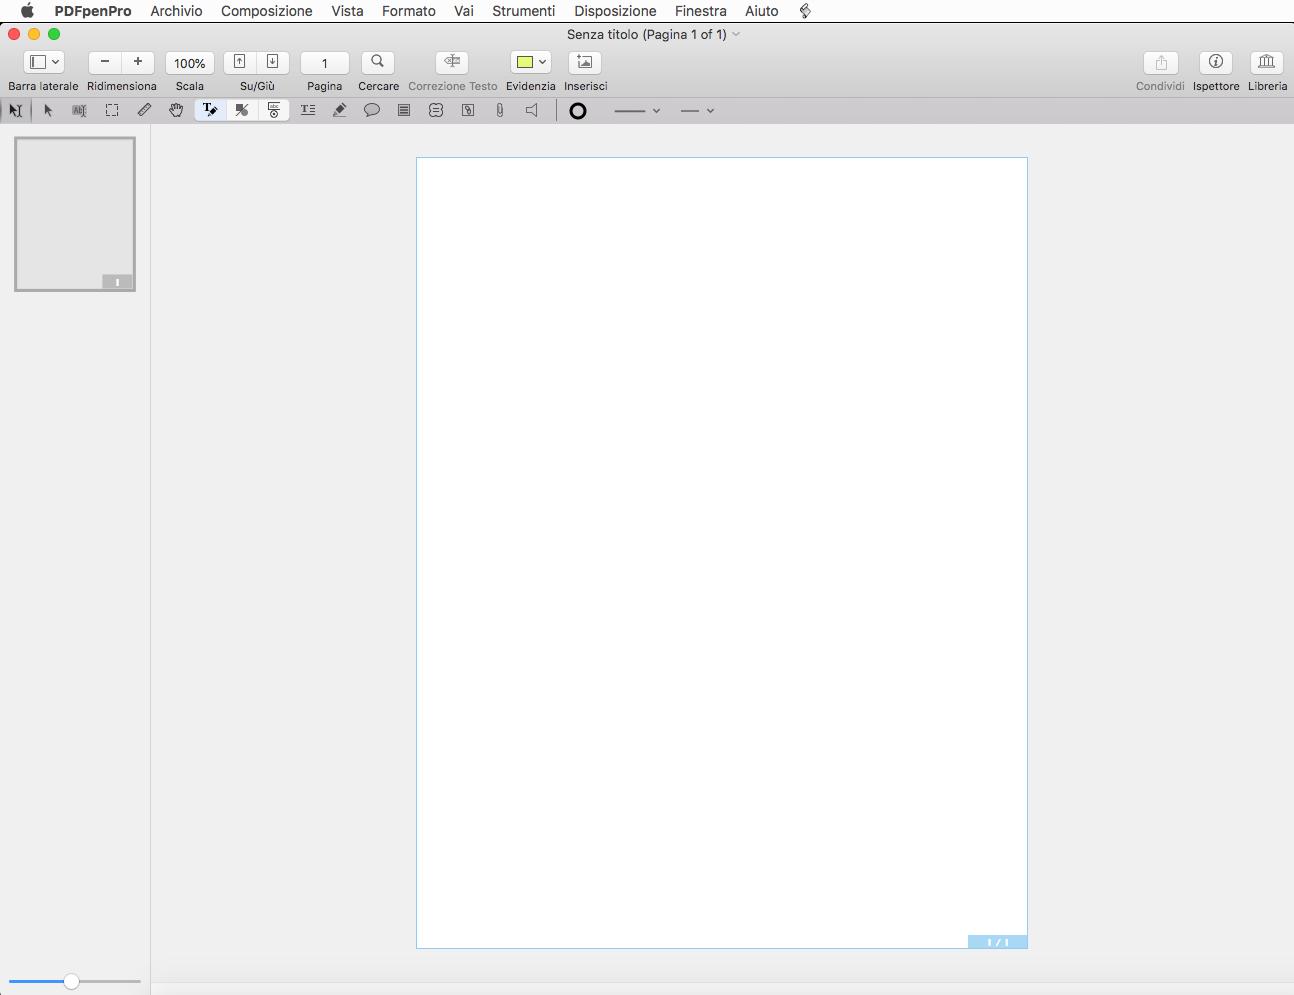 [MAC] PDFpenPro 11.2.1 macOS - ITA